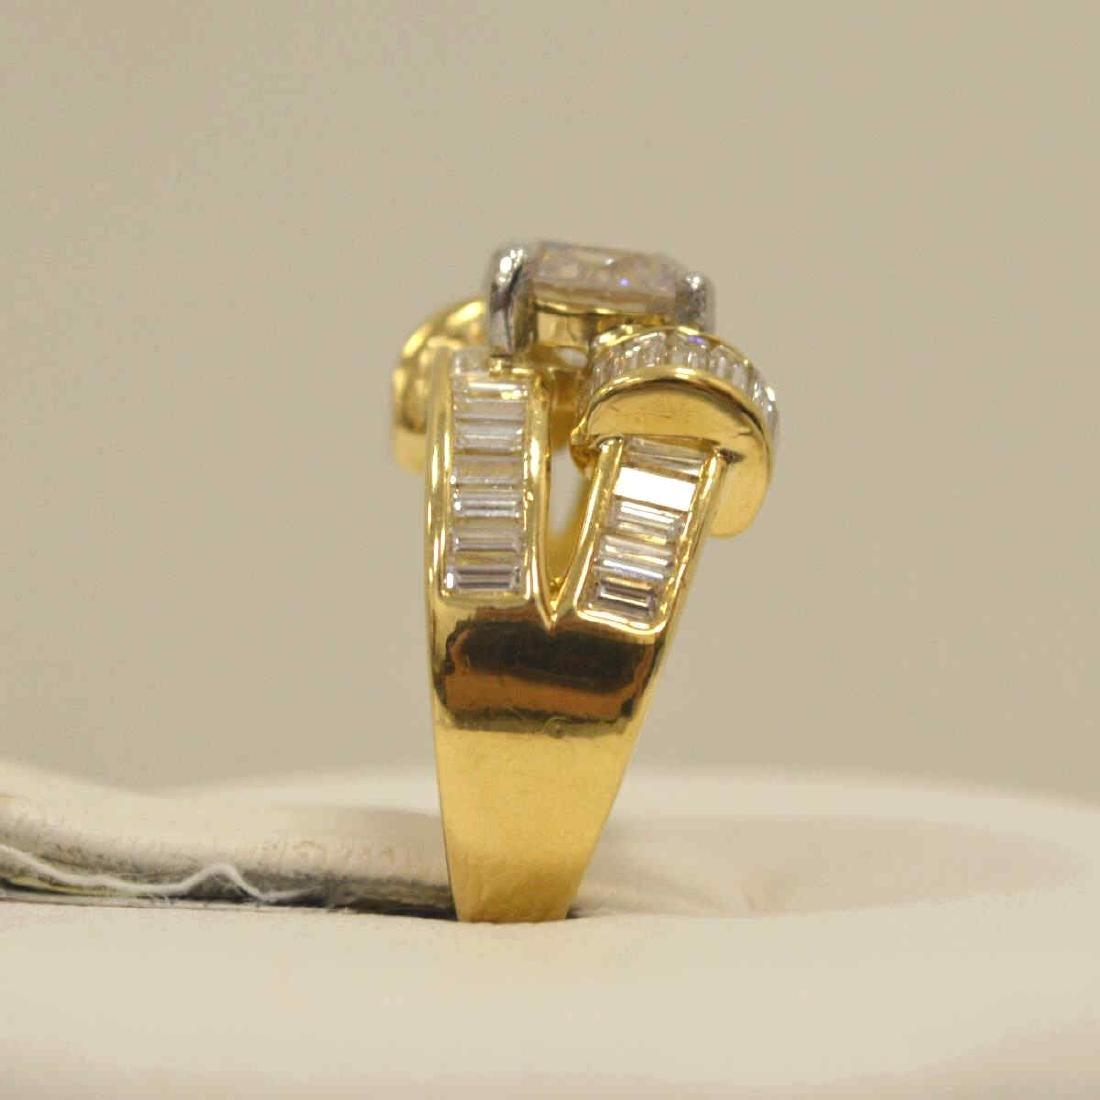 18kt yellow gold diamond fashion ring - 4